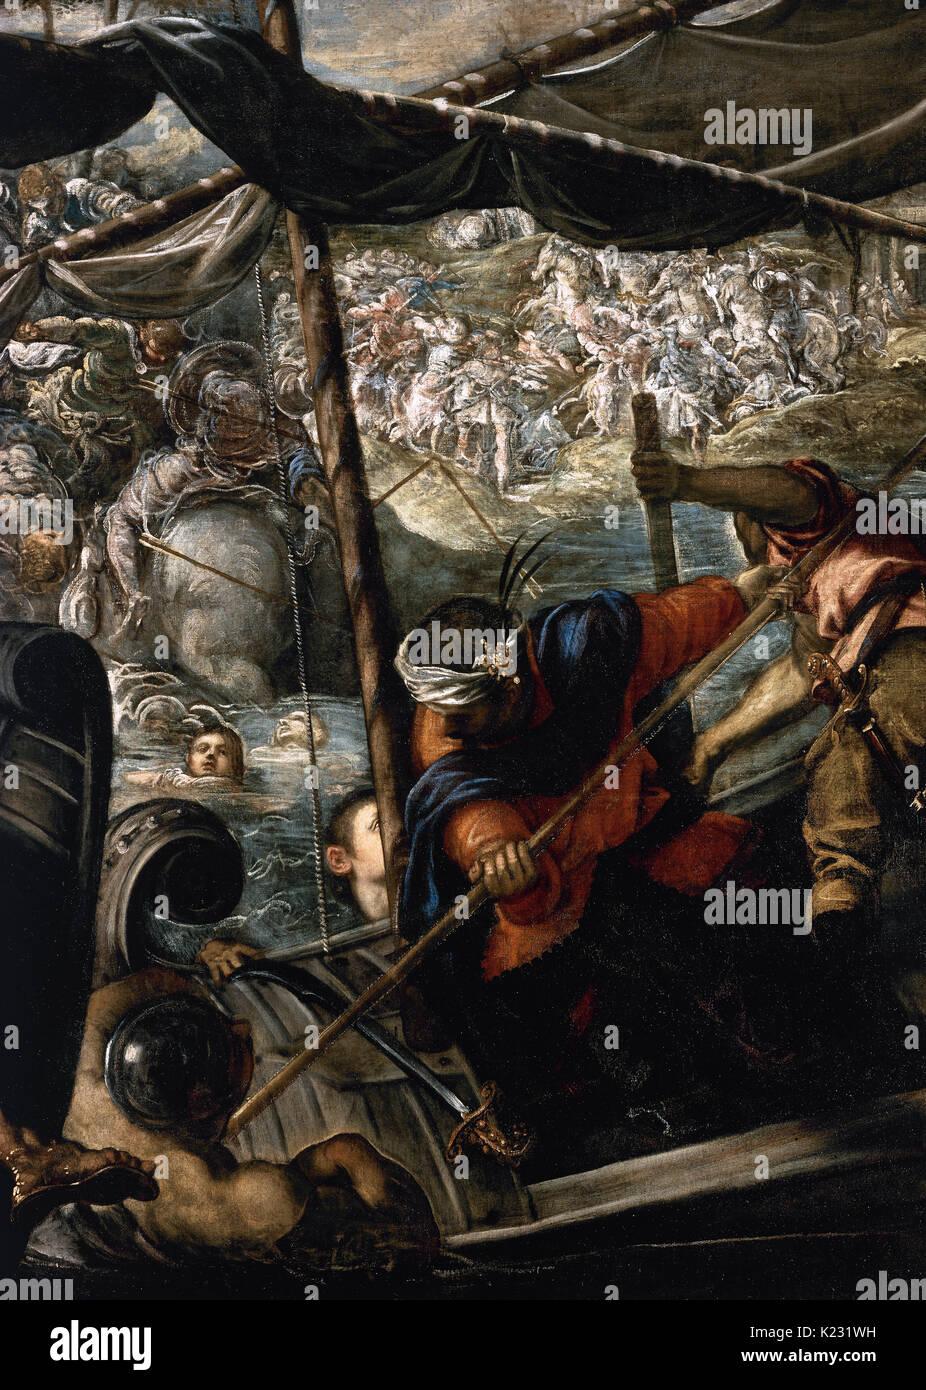 Tintoretto (Jacopo Robusti) (1518-1594). Italian painter. The Abduction of Helen, 1578-1579. Prado Museum. Madrid. Spain. - Stock Image